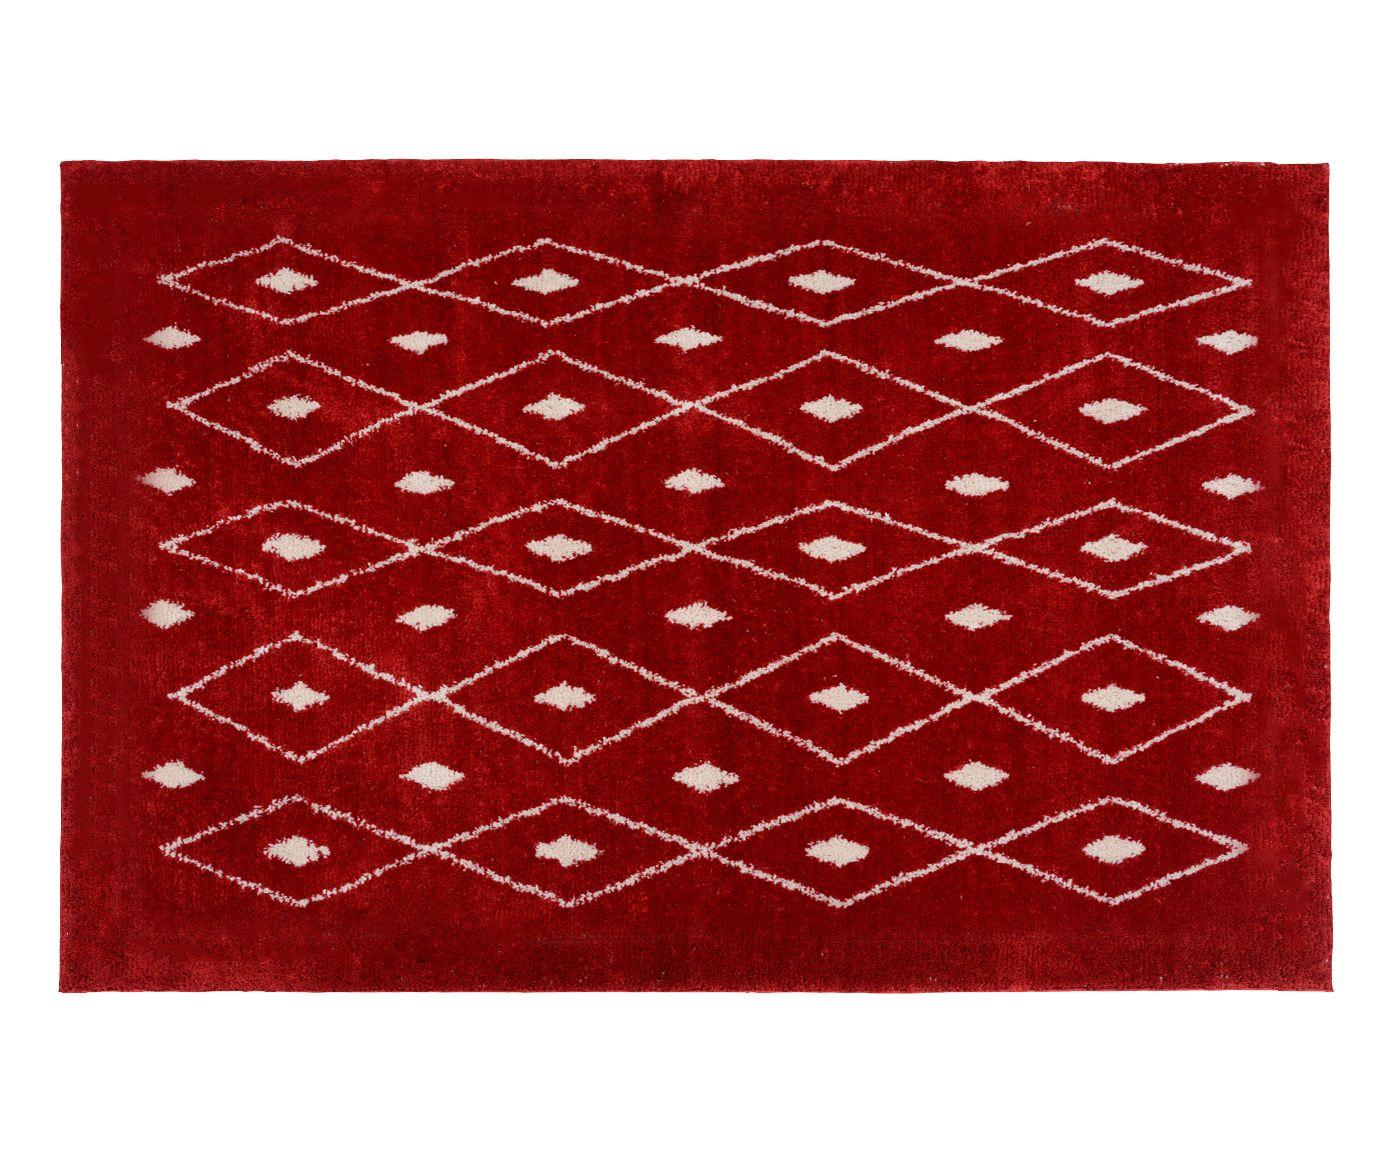 Tapete Art Kahina Rubi - 200X250cm, 200x250cm | Westwing.com.br